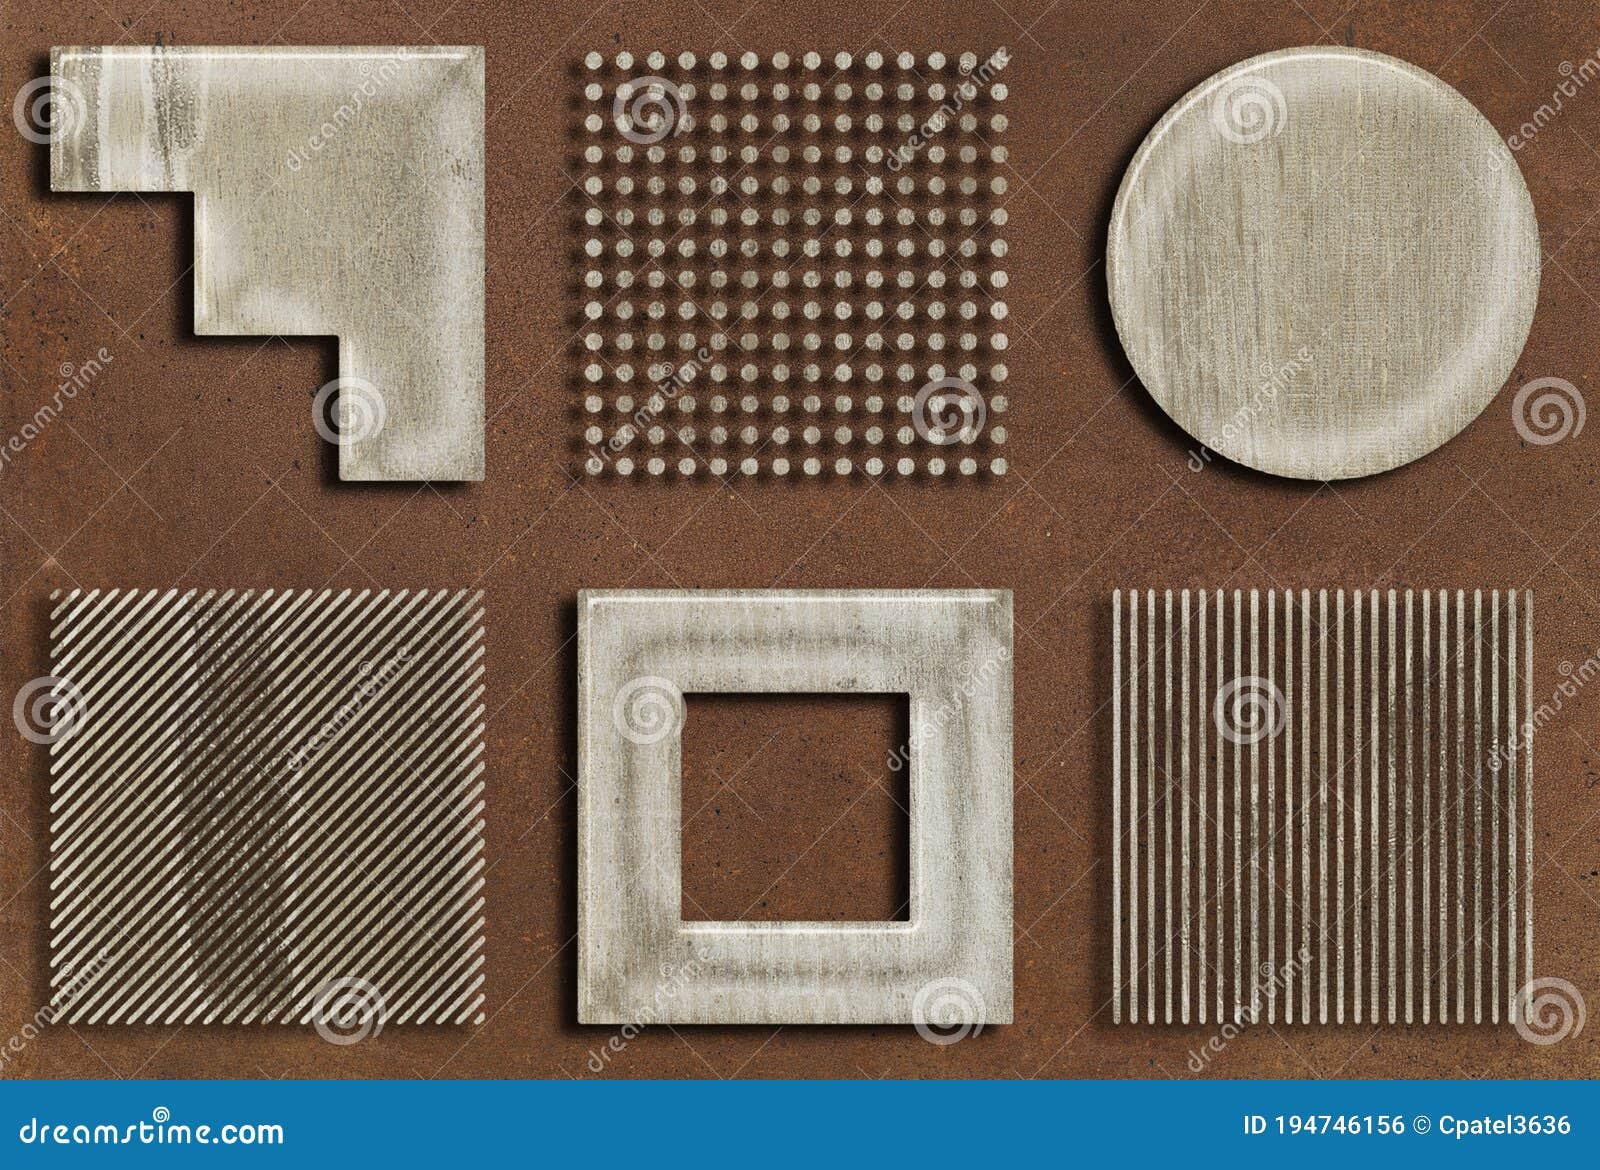 Digital Wall Art Prints Design Stock Photo Image Of Digital Ceramic 194746156